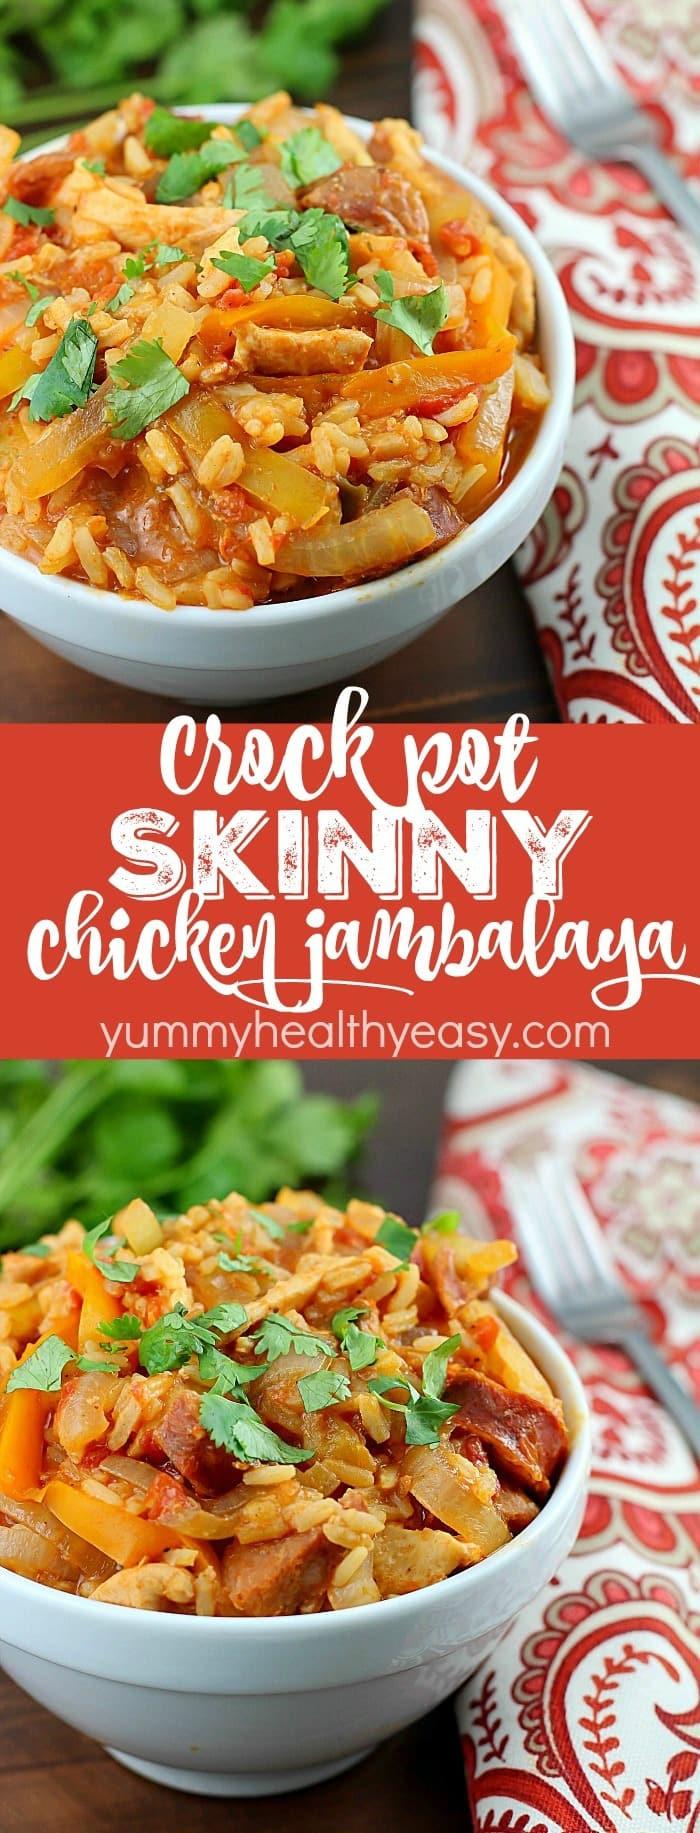 Low Calorie Crock Pot Chicken Breast Recipes  Crock Pot Skinny Chicken Jambalaya Yummy Healthy Easy